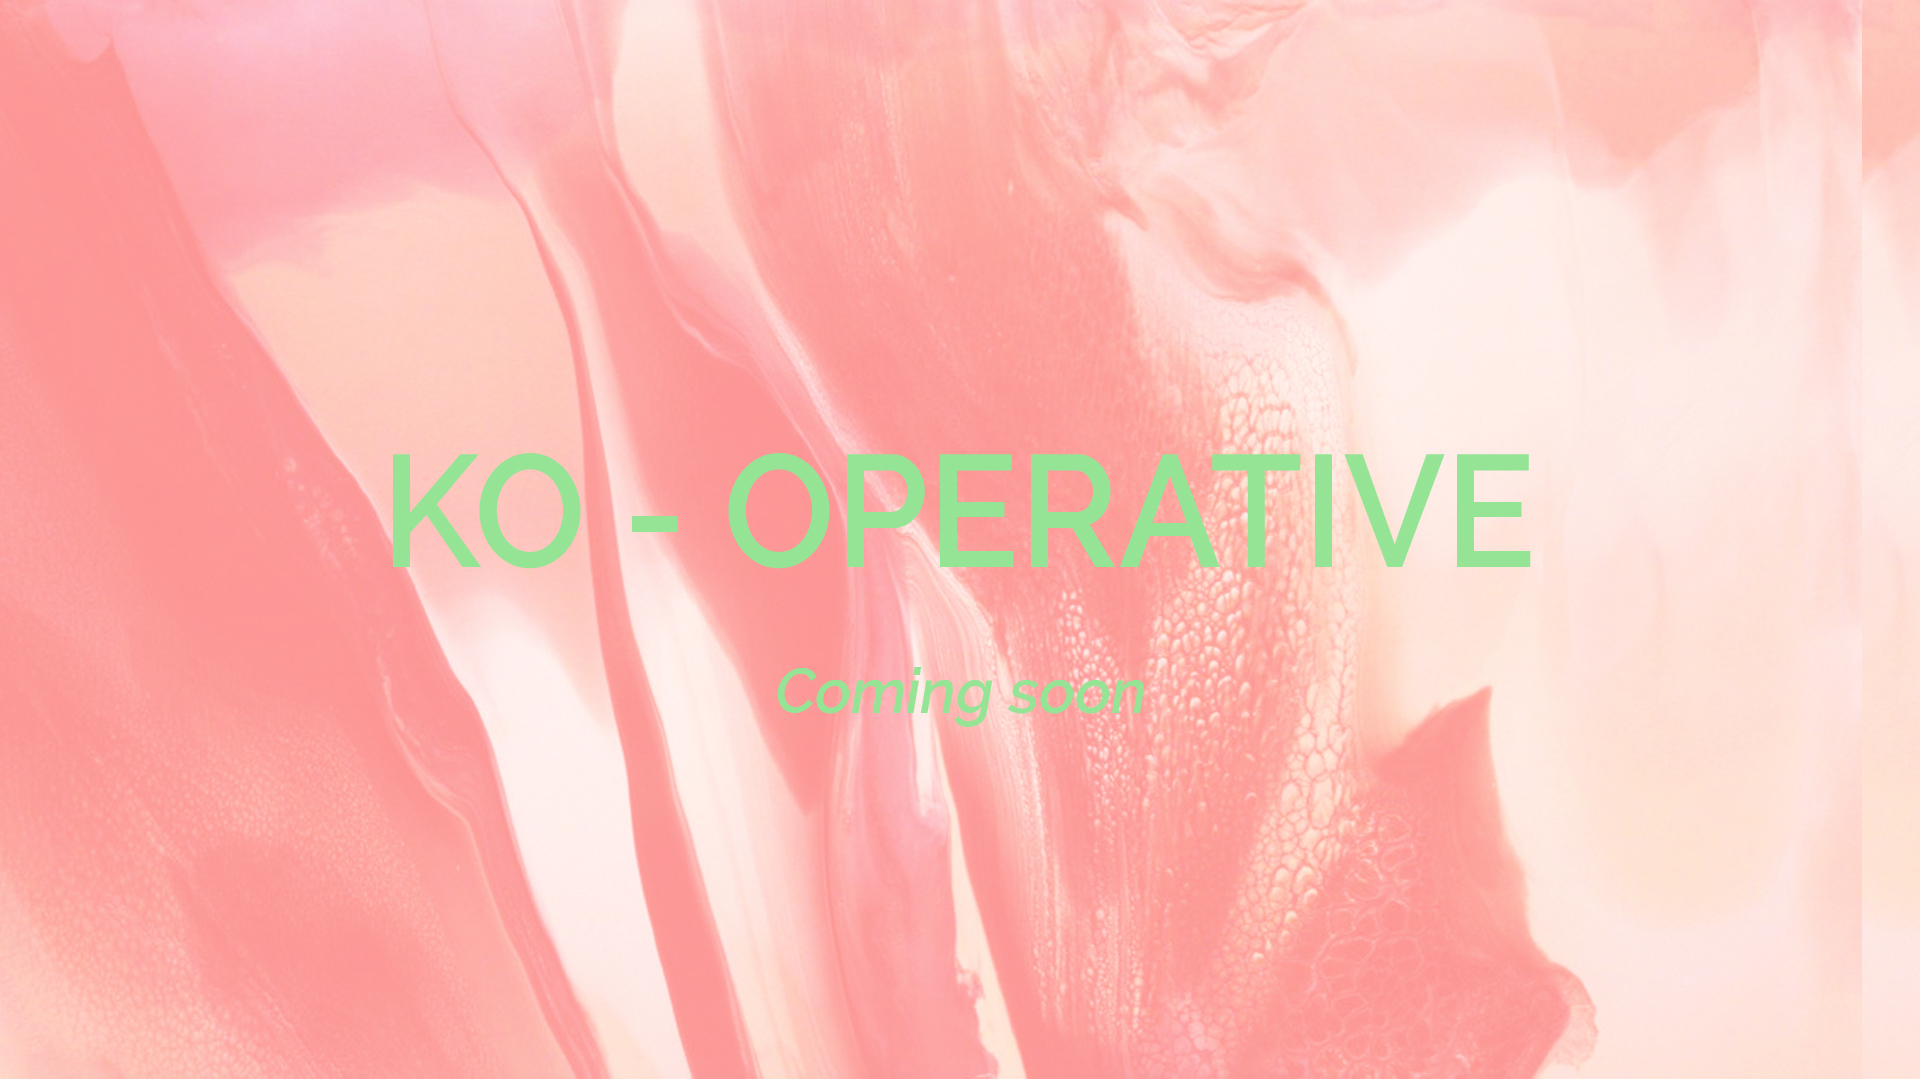 Ko-operative work in progress